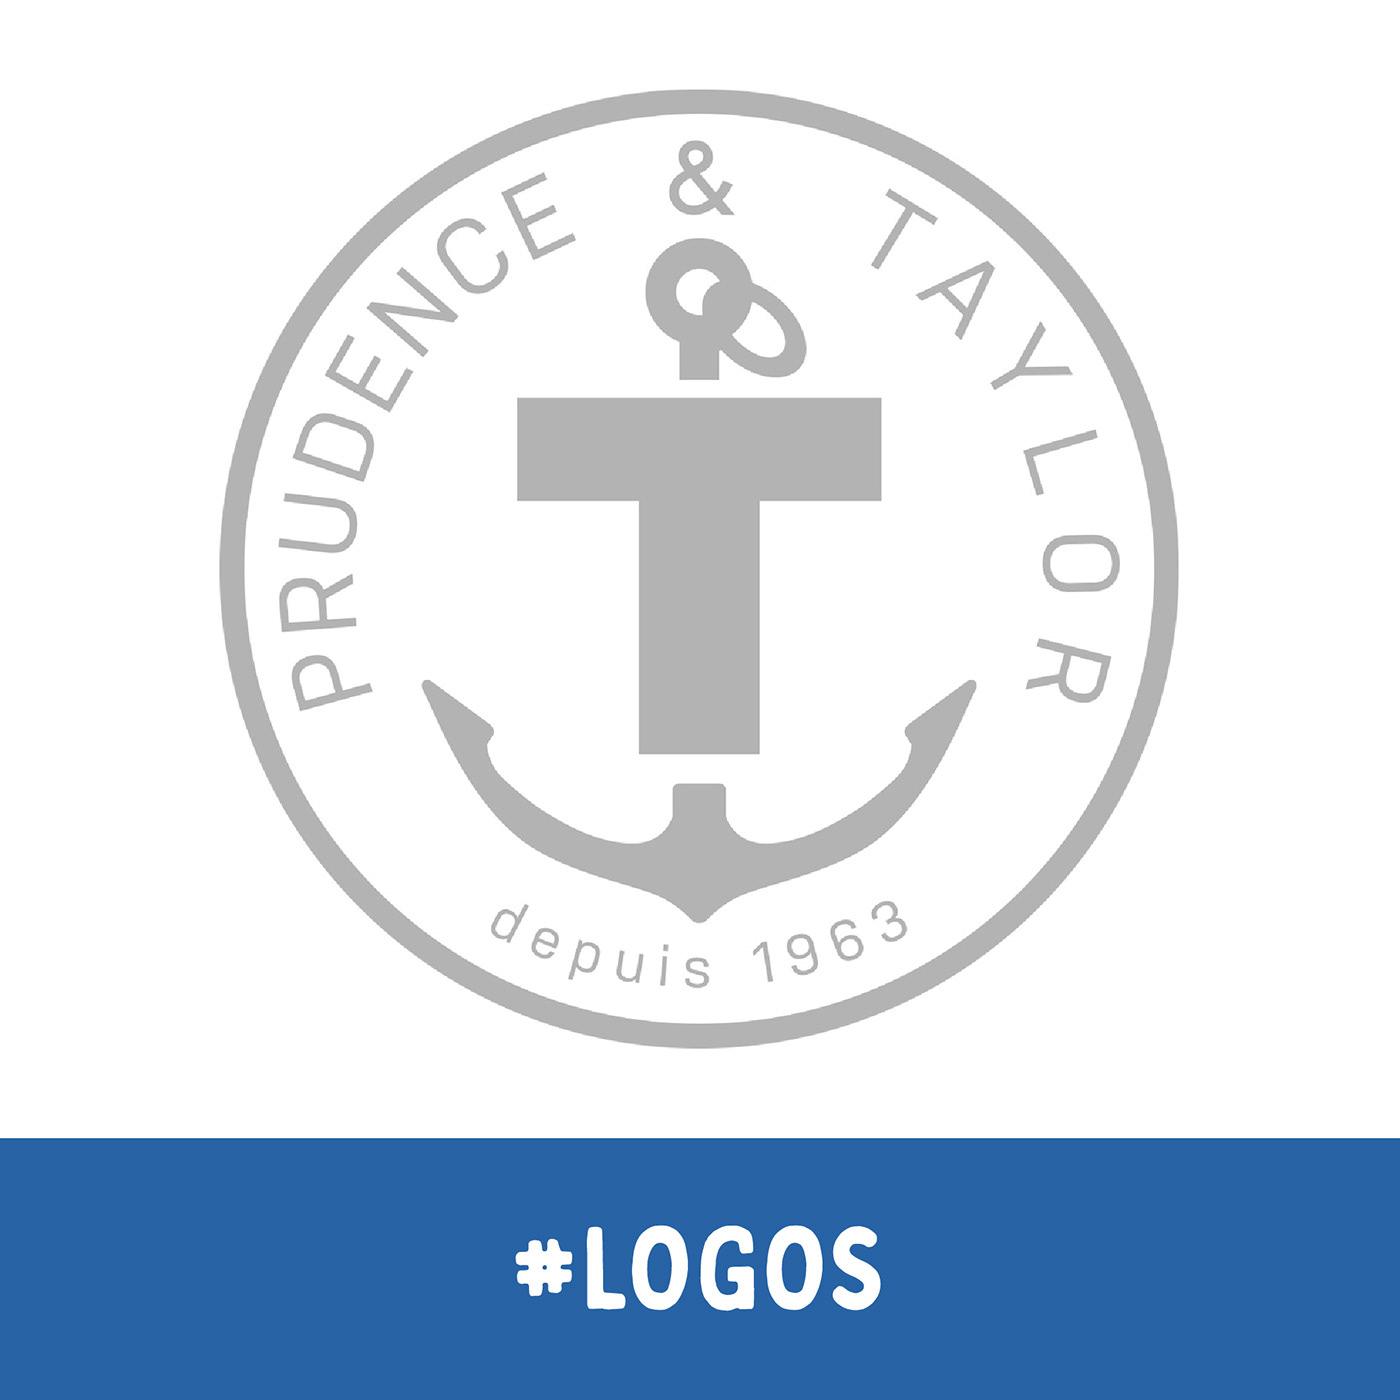 Logo Prudence & Taylor depuis 1963